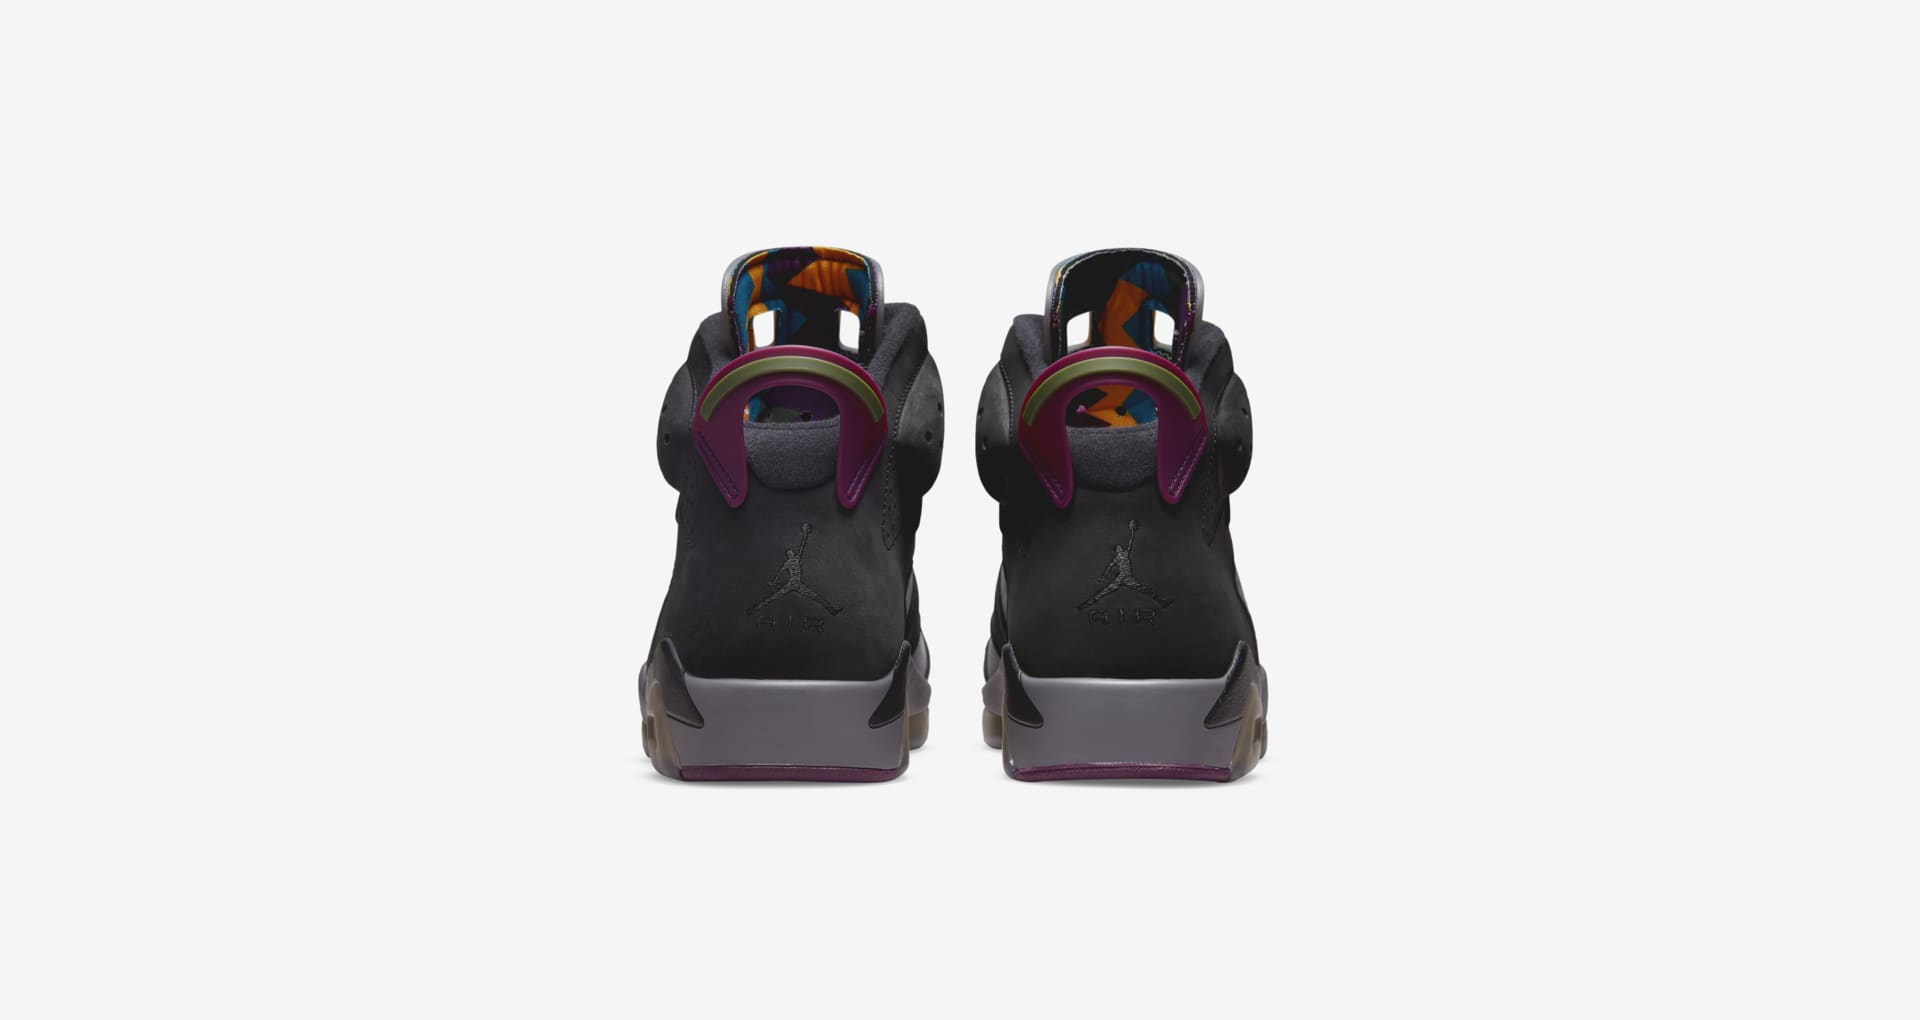 Air Jordan 1,Seafoam,Air Jorda  明日发售提醒!「波尔多红酒」AJ6、「鼠尾草」AJ1 同步登场!